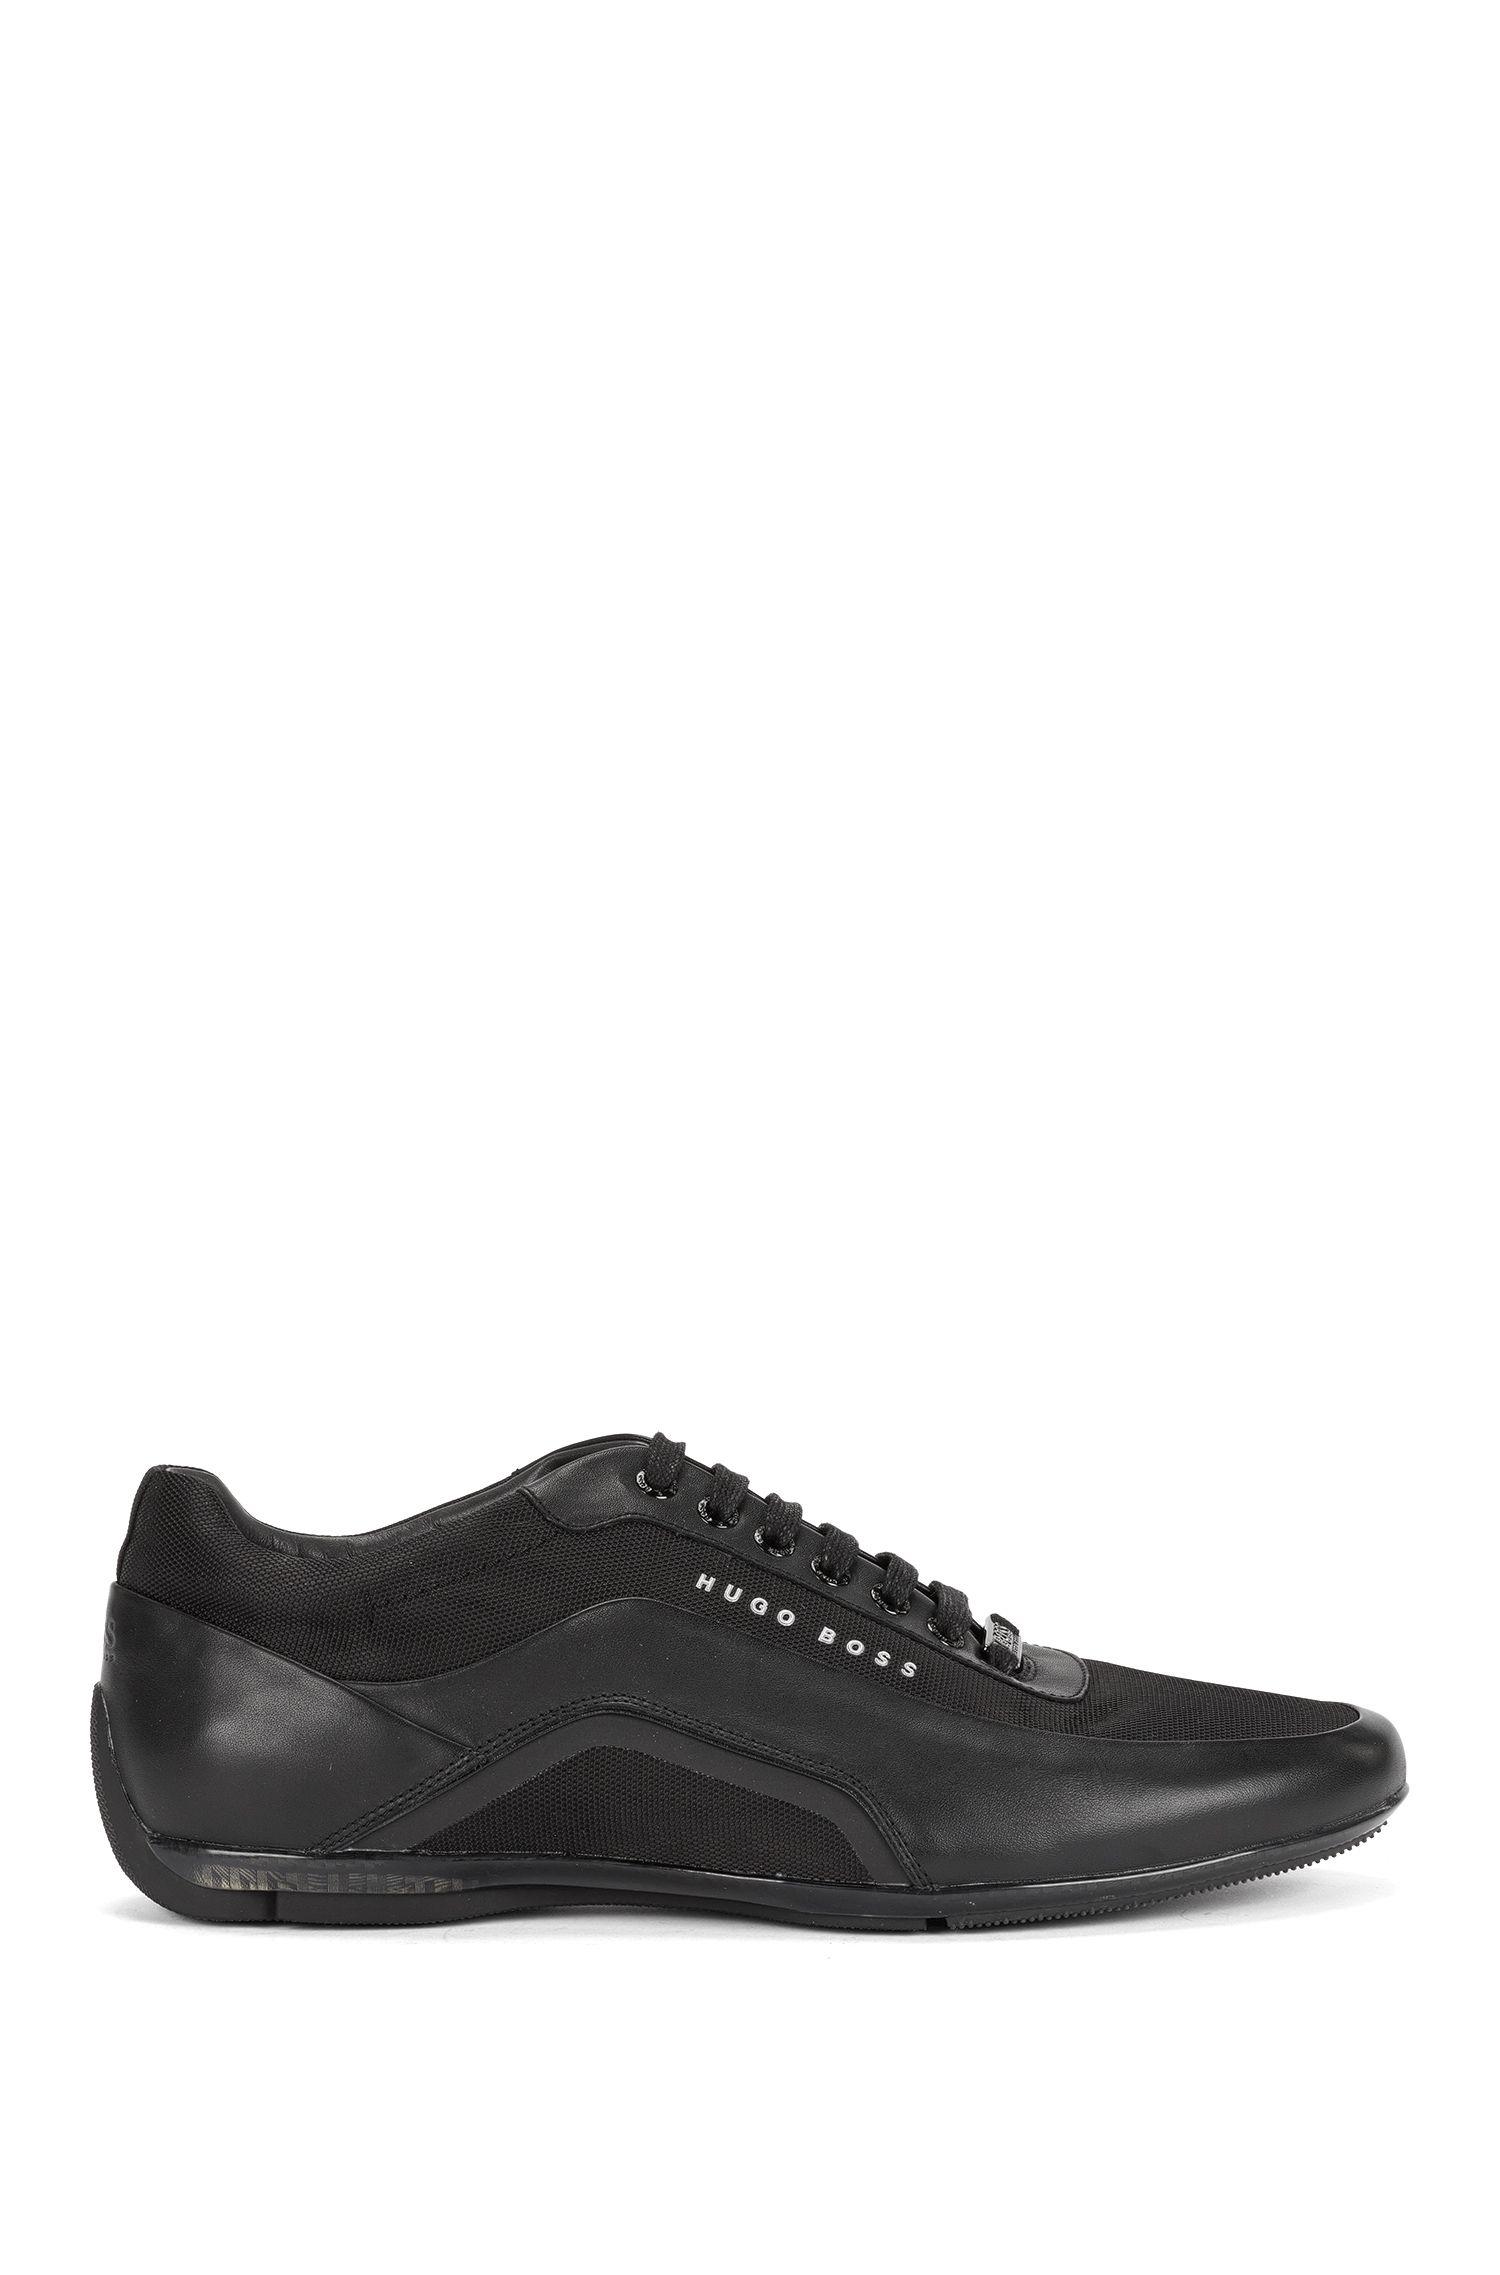 Sneakers in pelle con fibra al carbonio: 'Hbracing_Lowp_ltny'